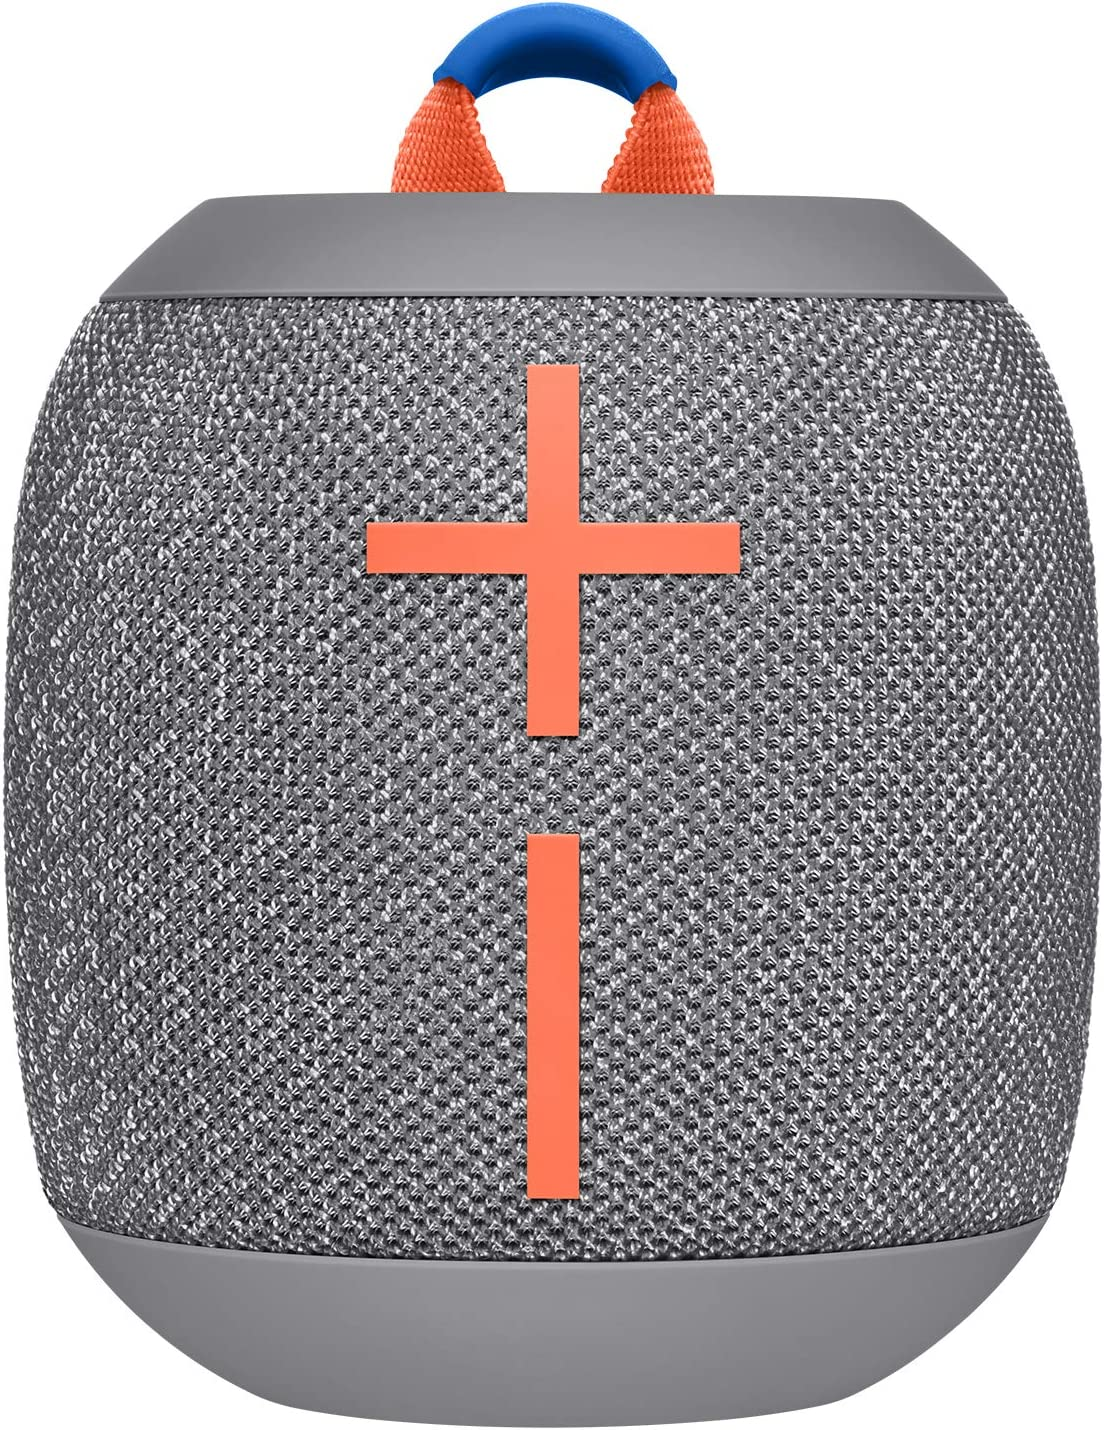 Ultimate Ears Wonderboom Altavoz Portátil Inalámbrico Bluetooth ...